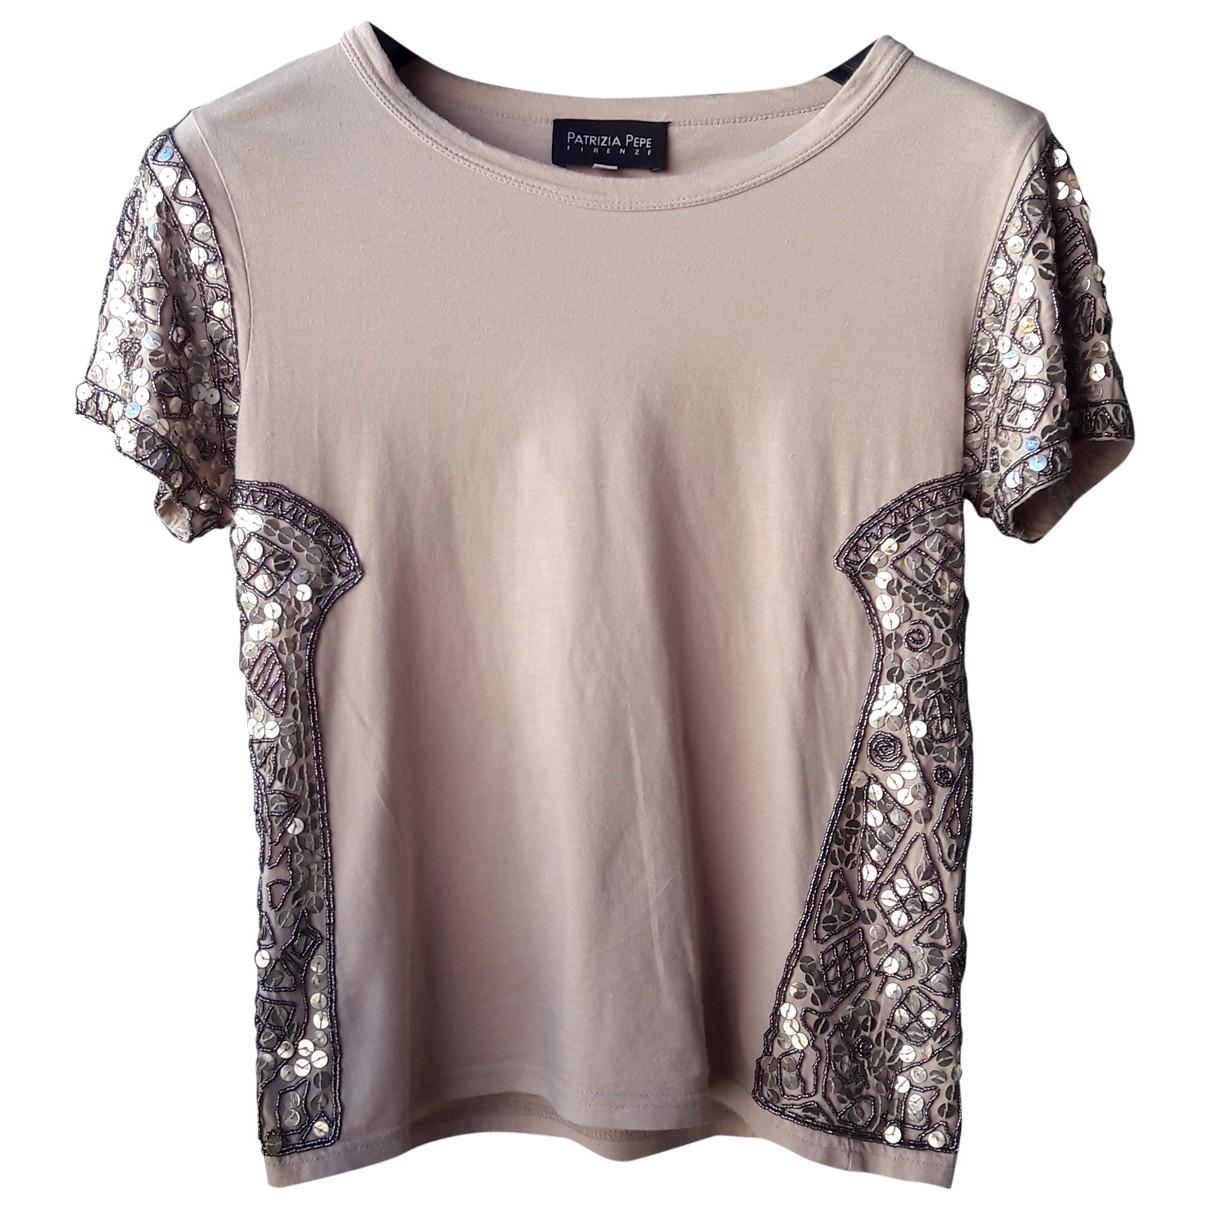 Camiseta Patrizia Pepe